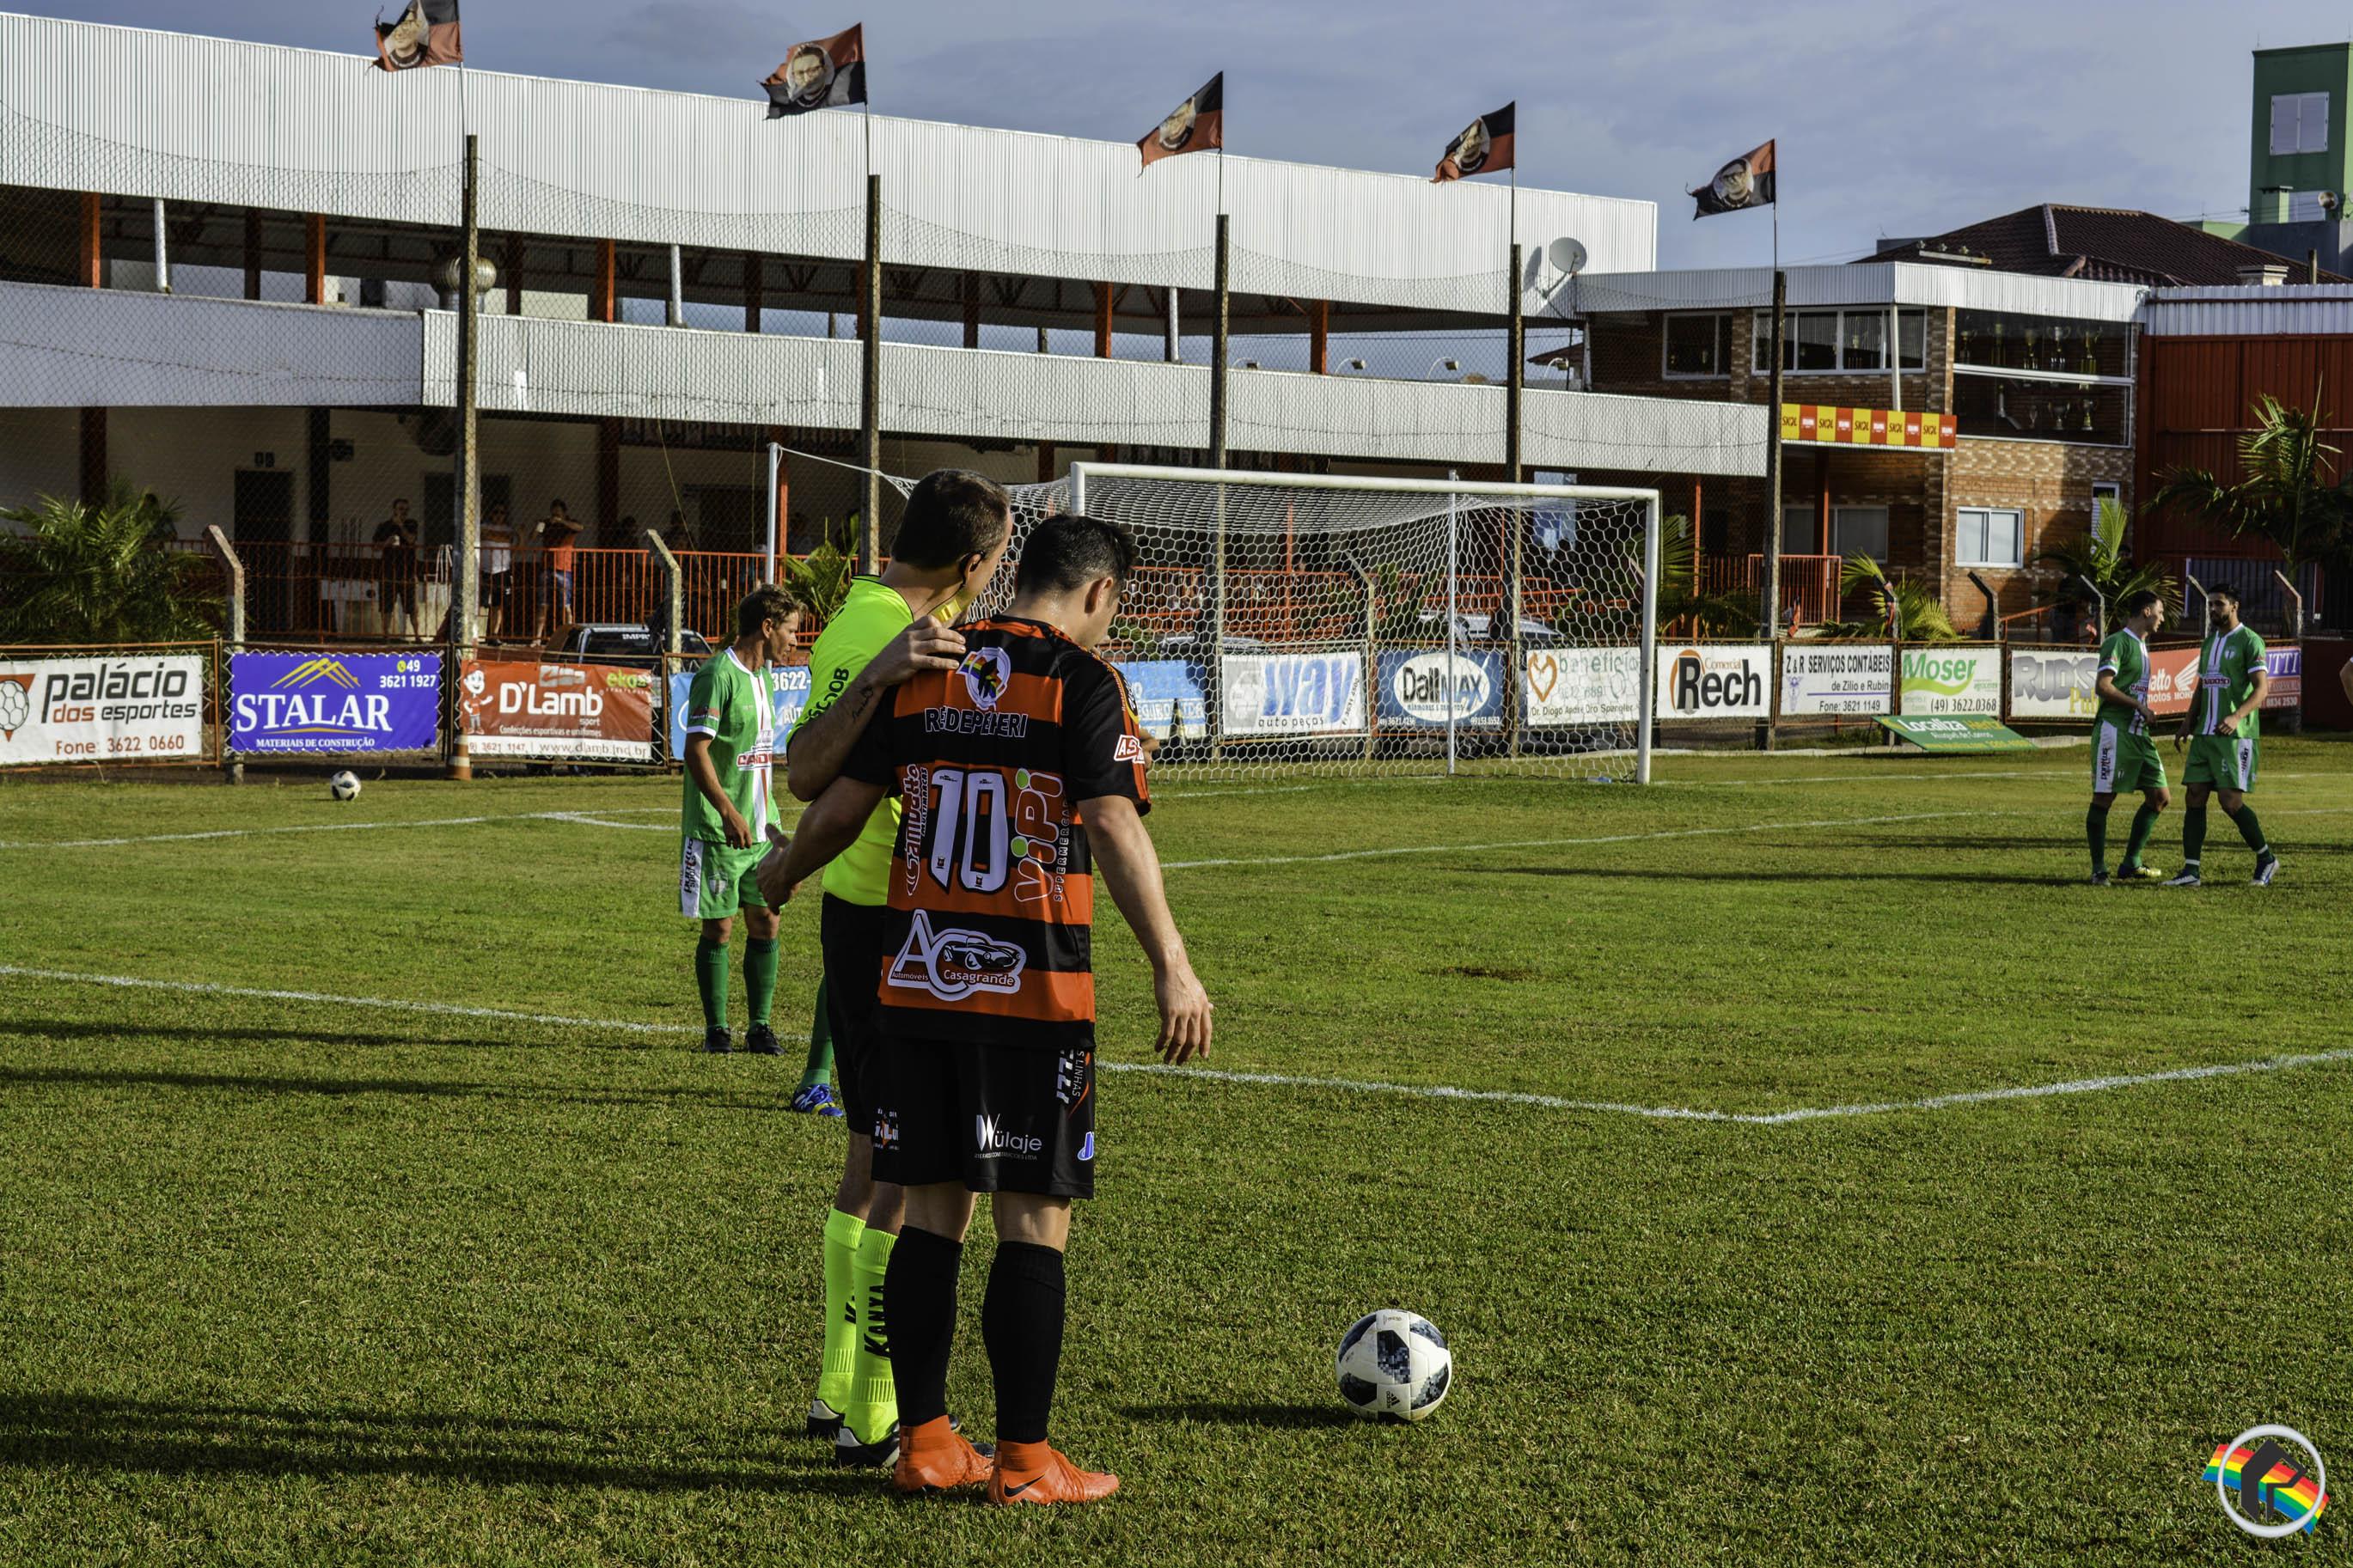 Peperi transmite Guarani e Maravilha pela quarta rodada do Estadual